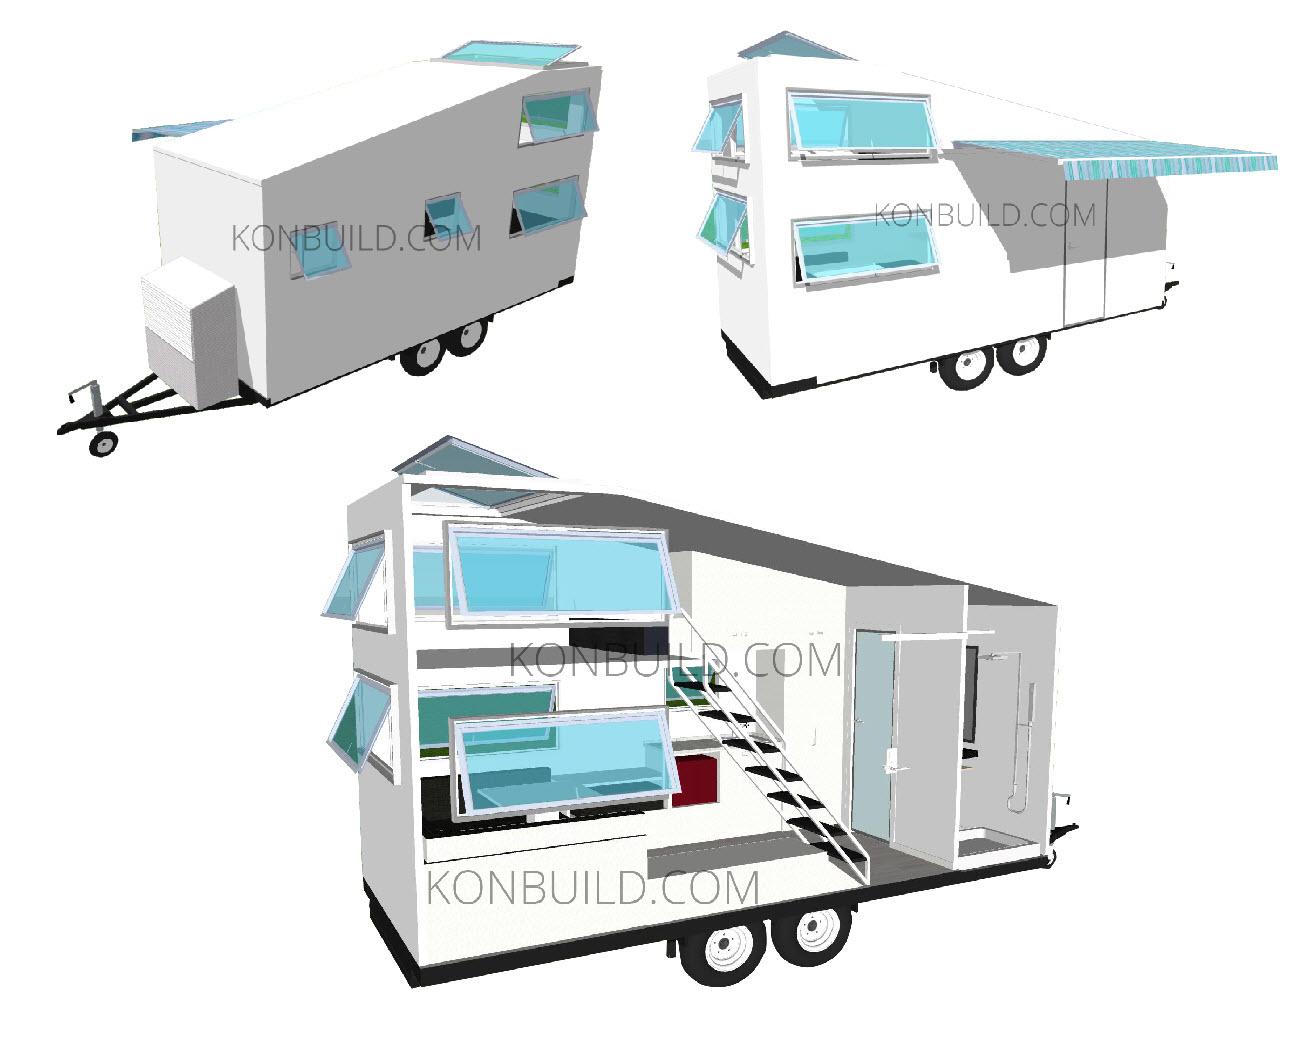 Affordable Portable Office Accommodation caravan travel trailer outside design.jpg